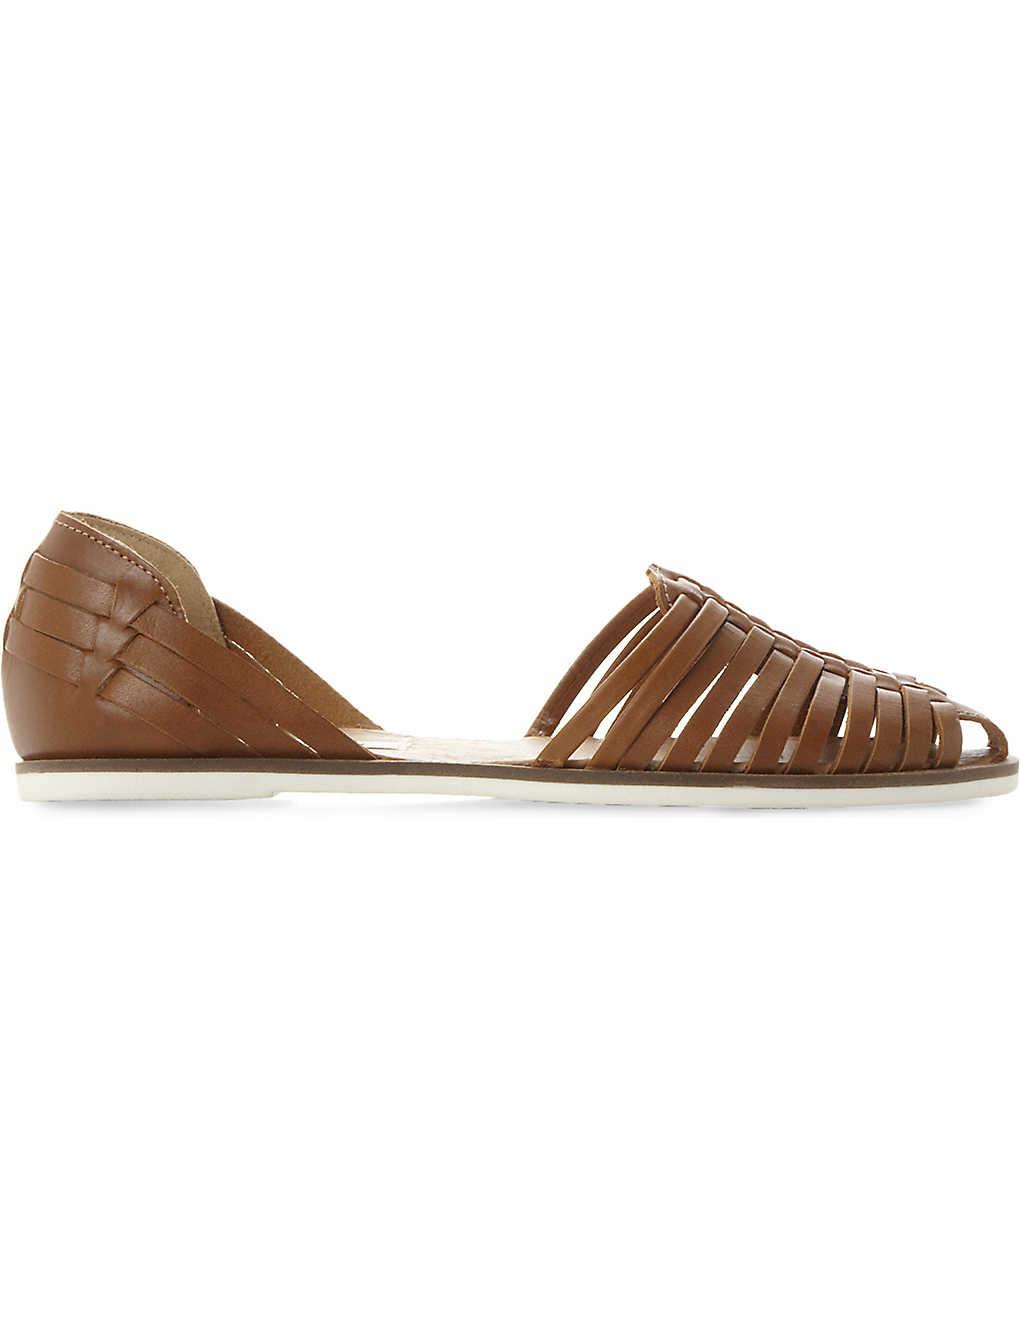 54c7bd95d81 STEVE MADDEN - Hillarie leather huarache sandals | Selfridges.com